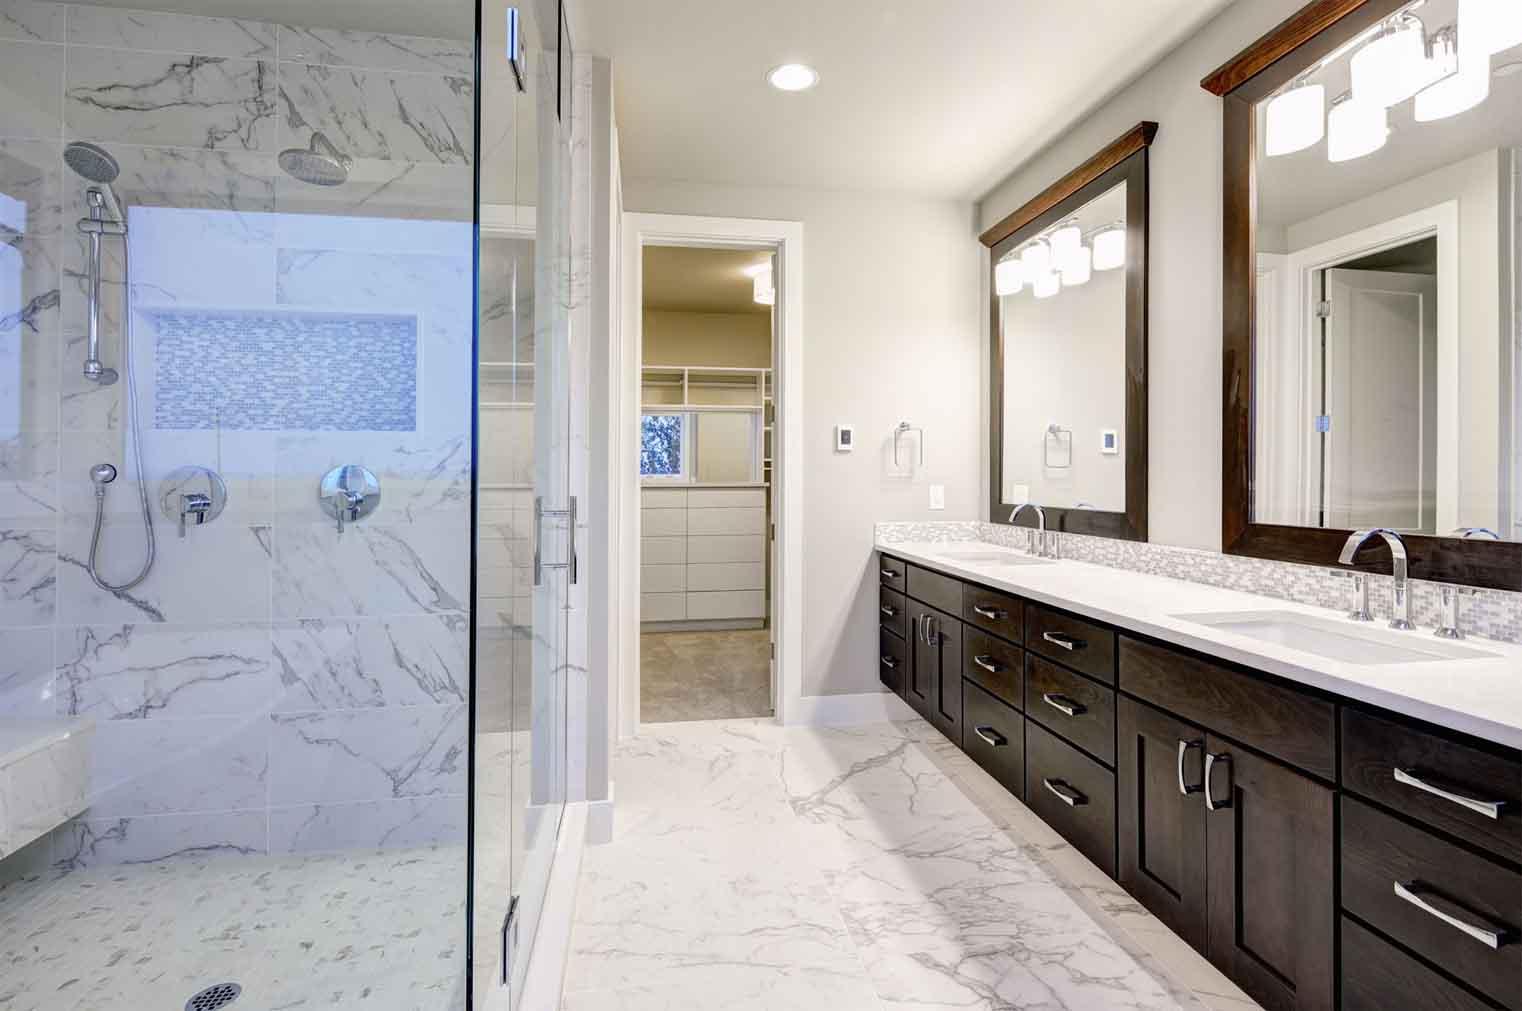 DIY Bathroom Renovation Tips